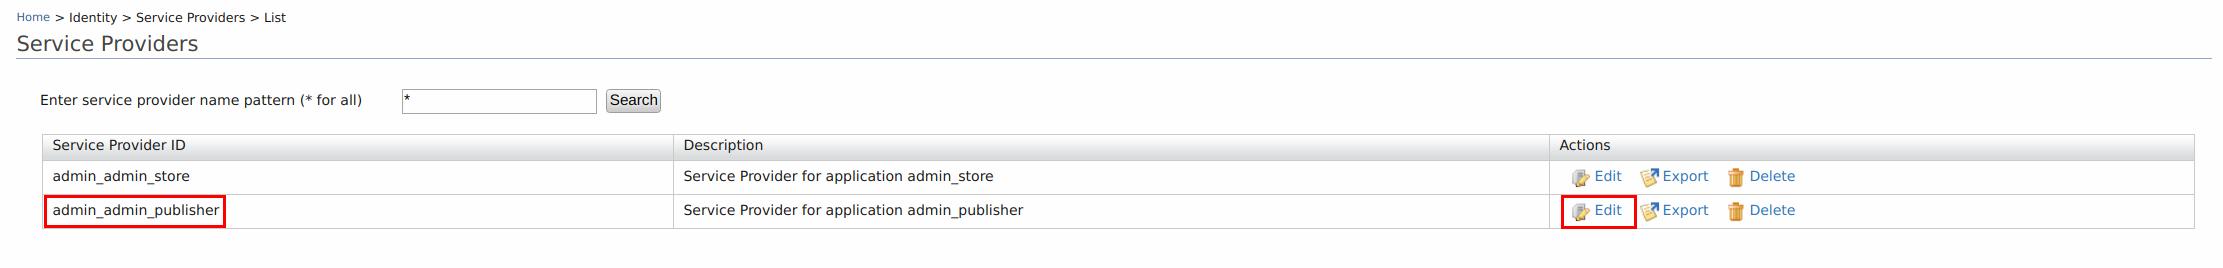 Service Providers List